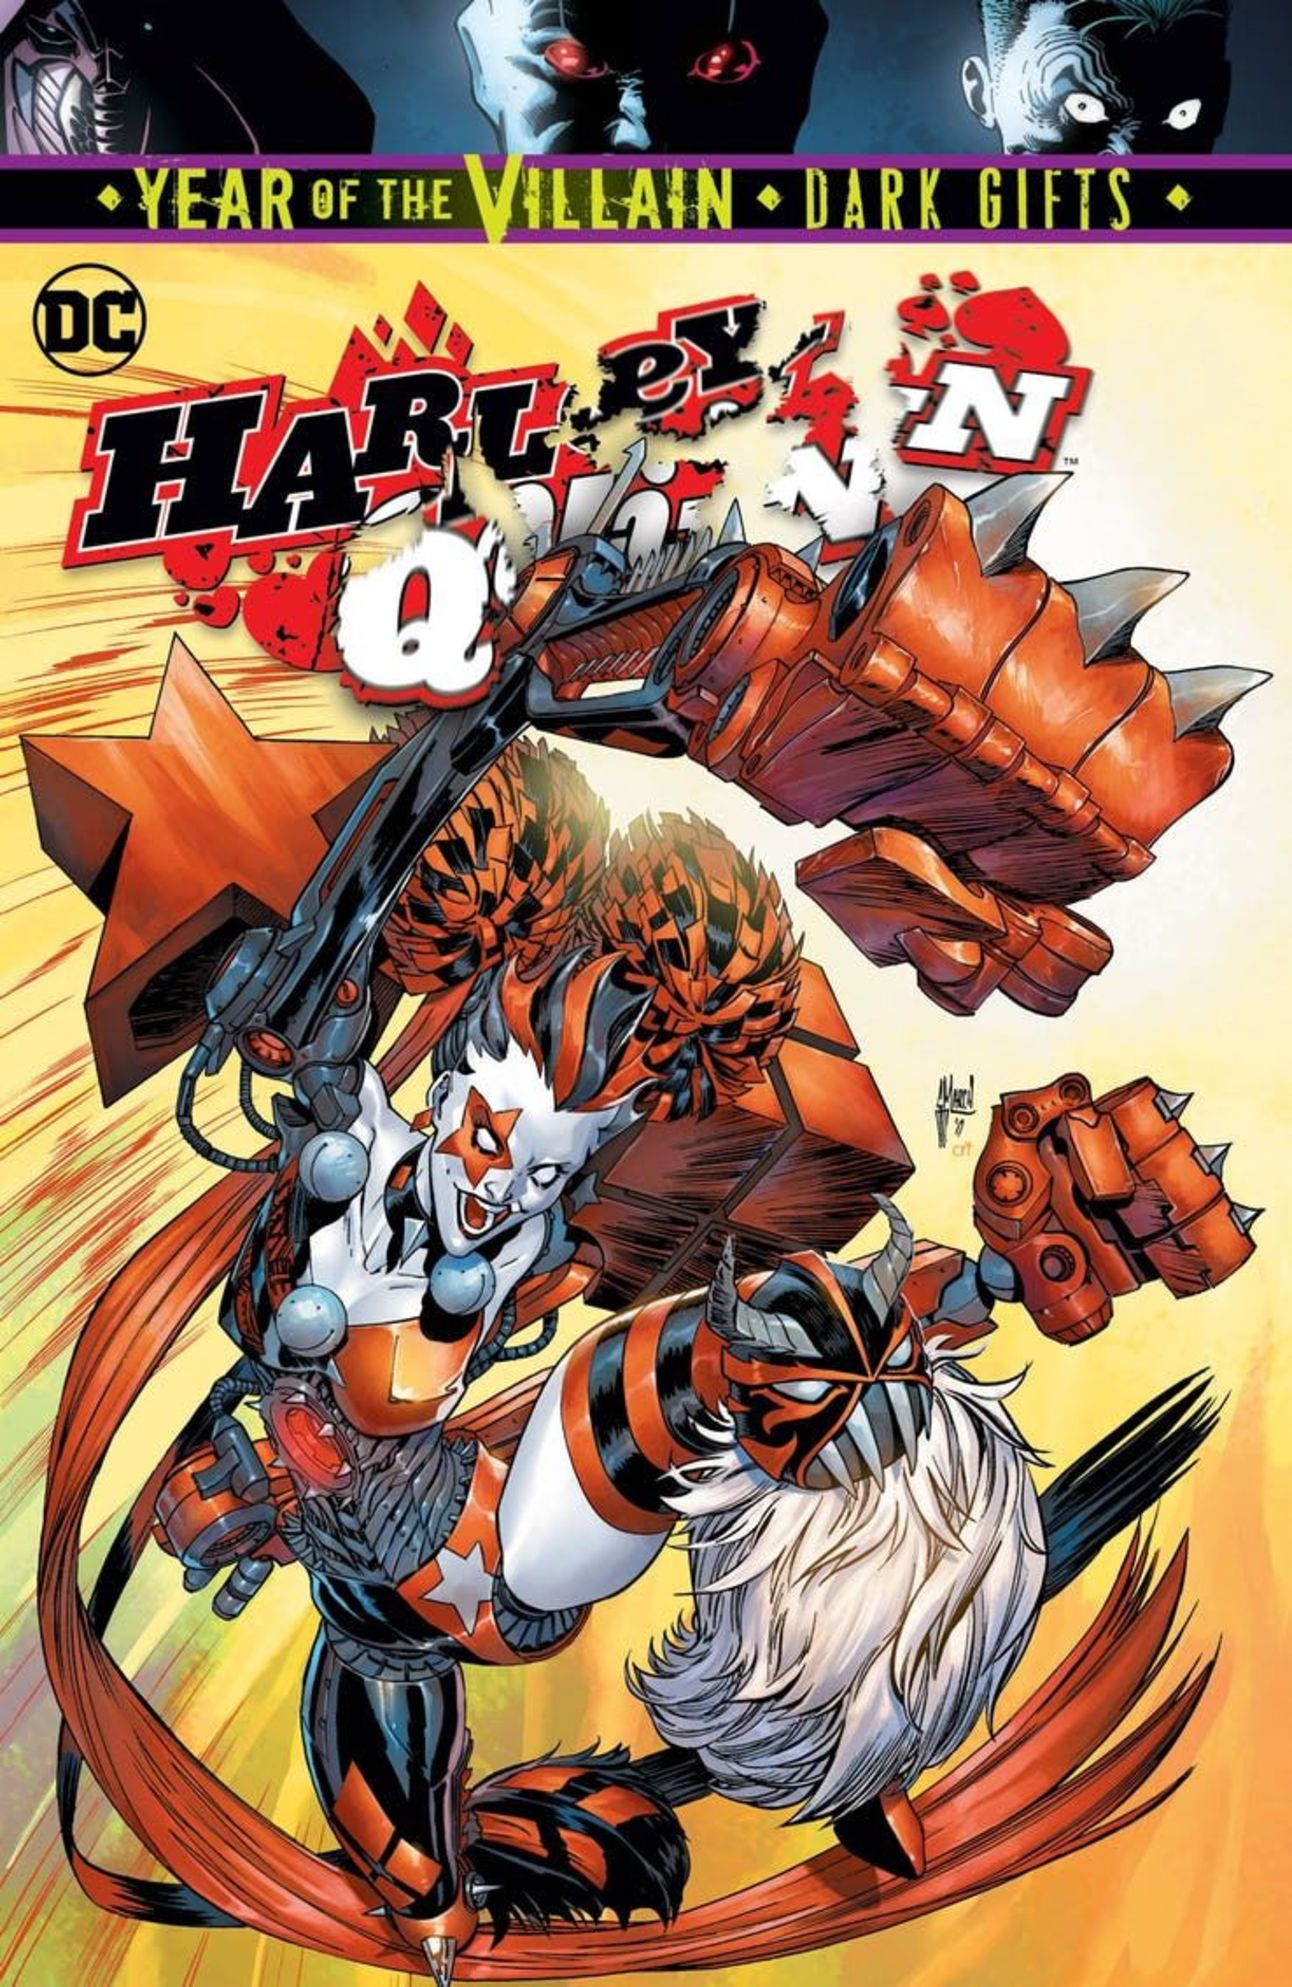 HARLEY QUINN #64 VARIANT SET FRANK CHO DARK GIFTS HUMPHRIES DC COMIC 8//7